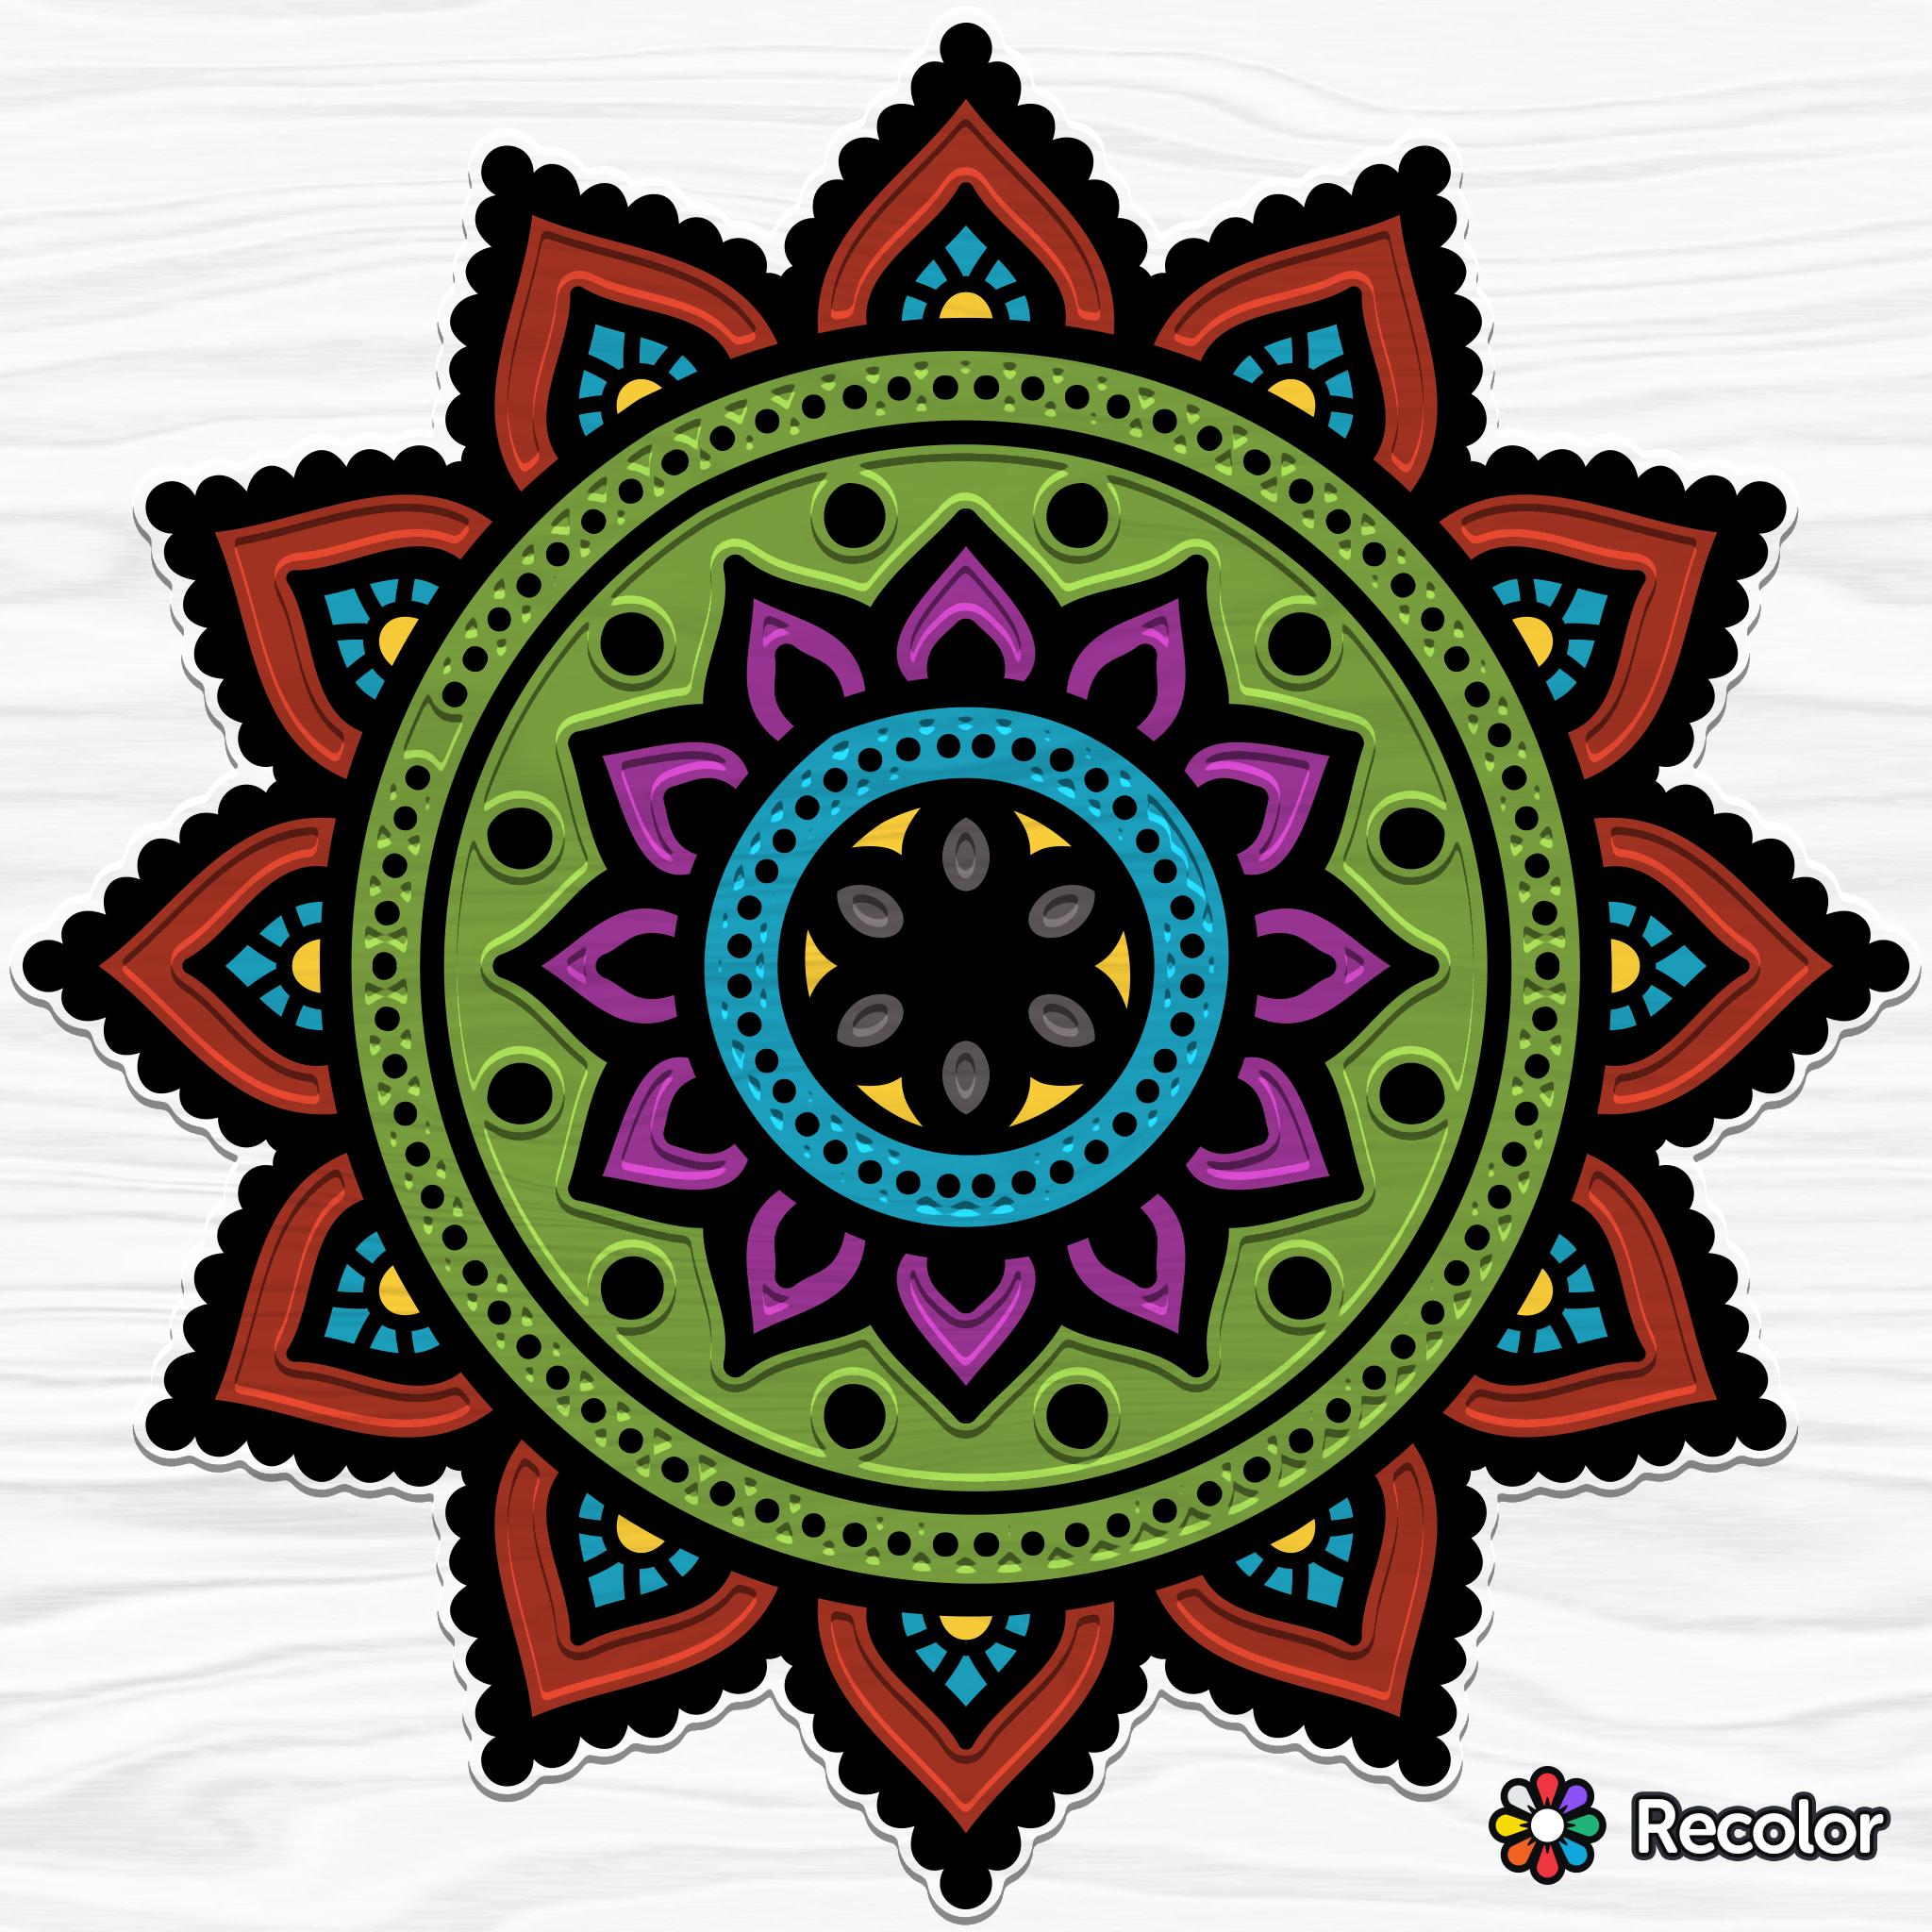 Pin de olga lucia campuzano en cojin 1 | Pinterest